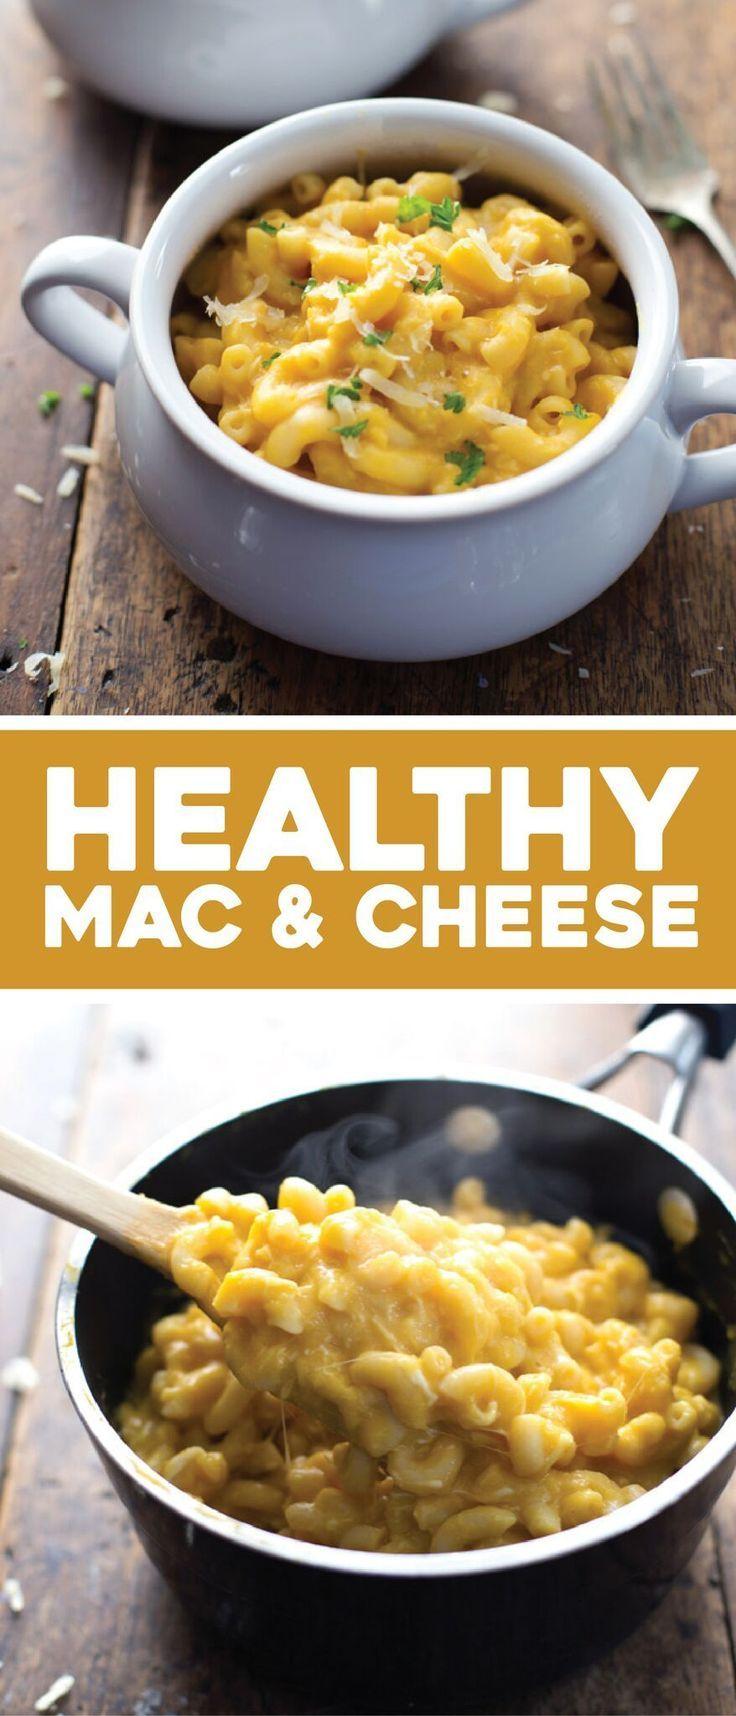 Healthy Mac and Cheese Healthy Mac and Cheese